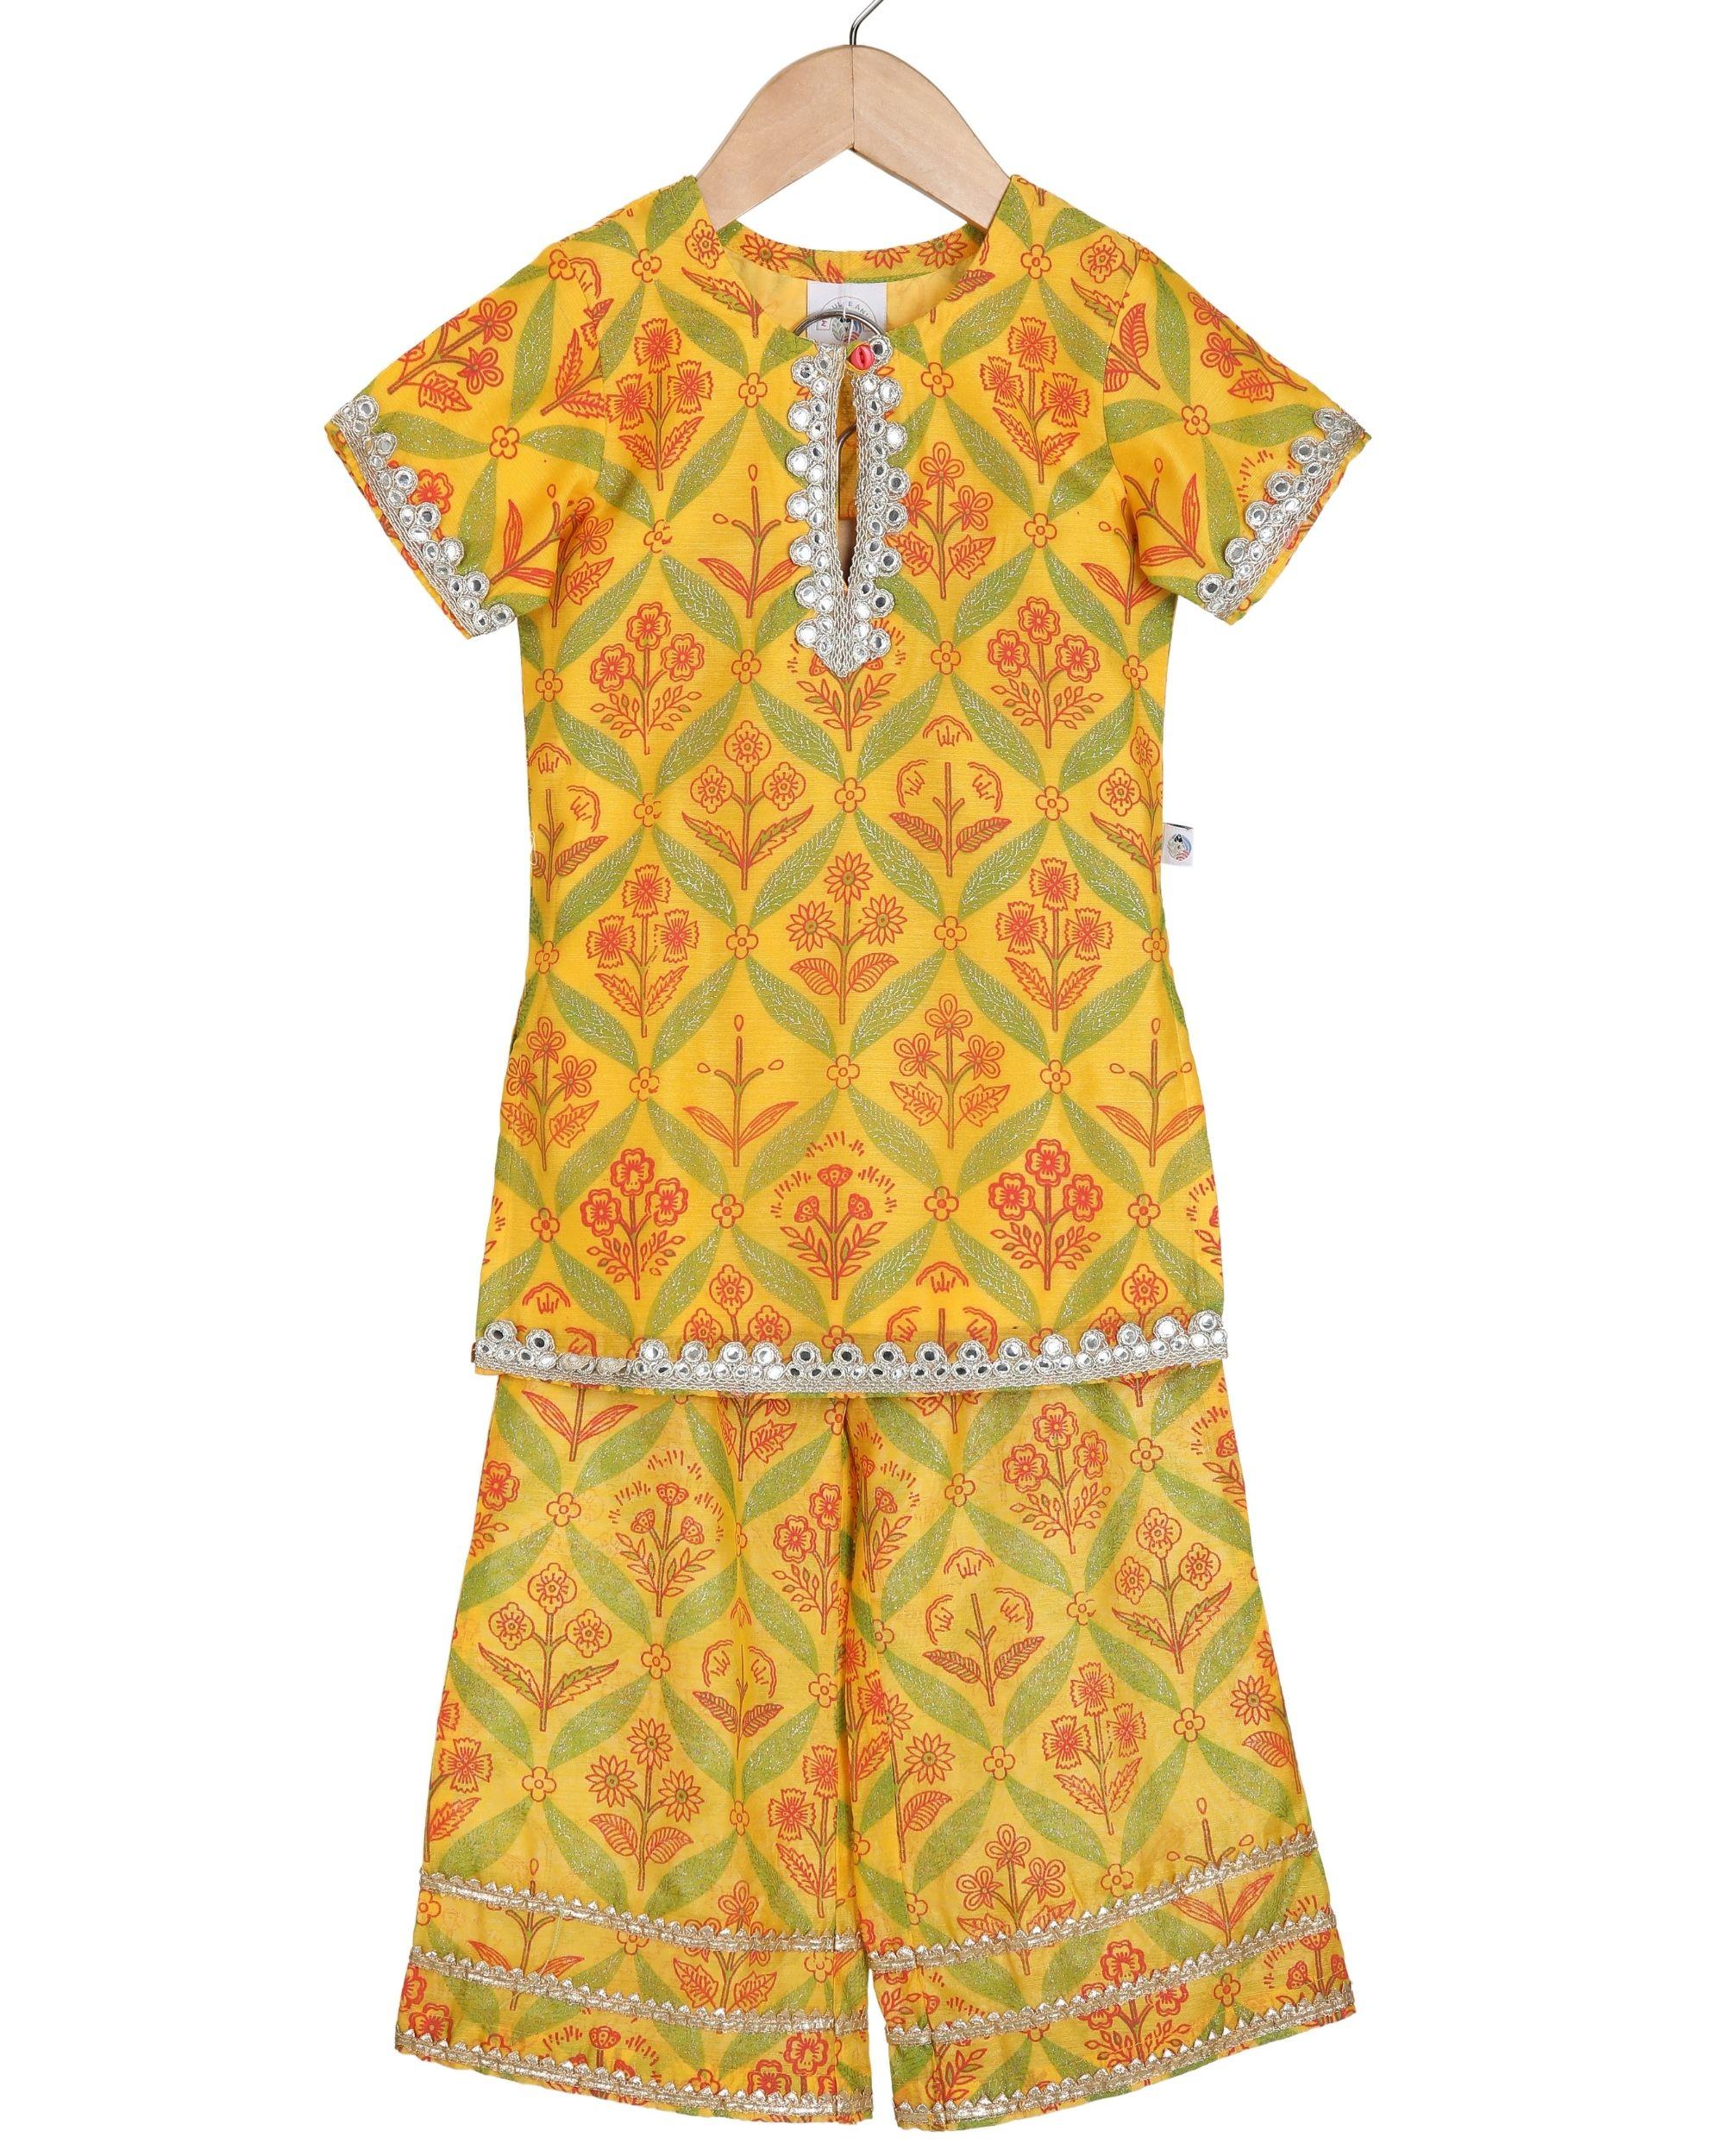 Saffron mirror embroidery kurta and palazzo - set of two